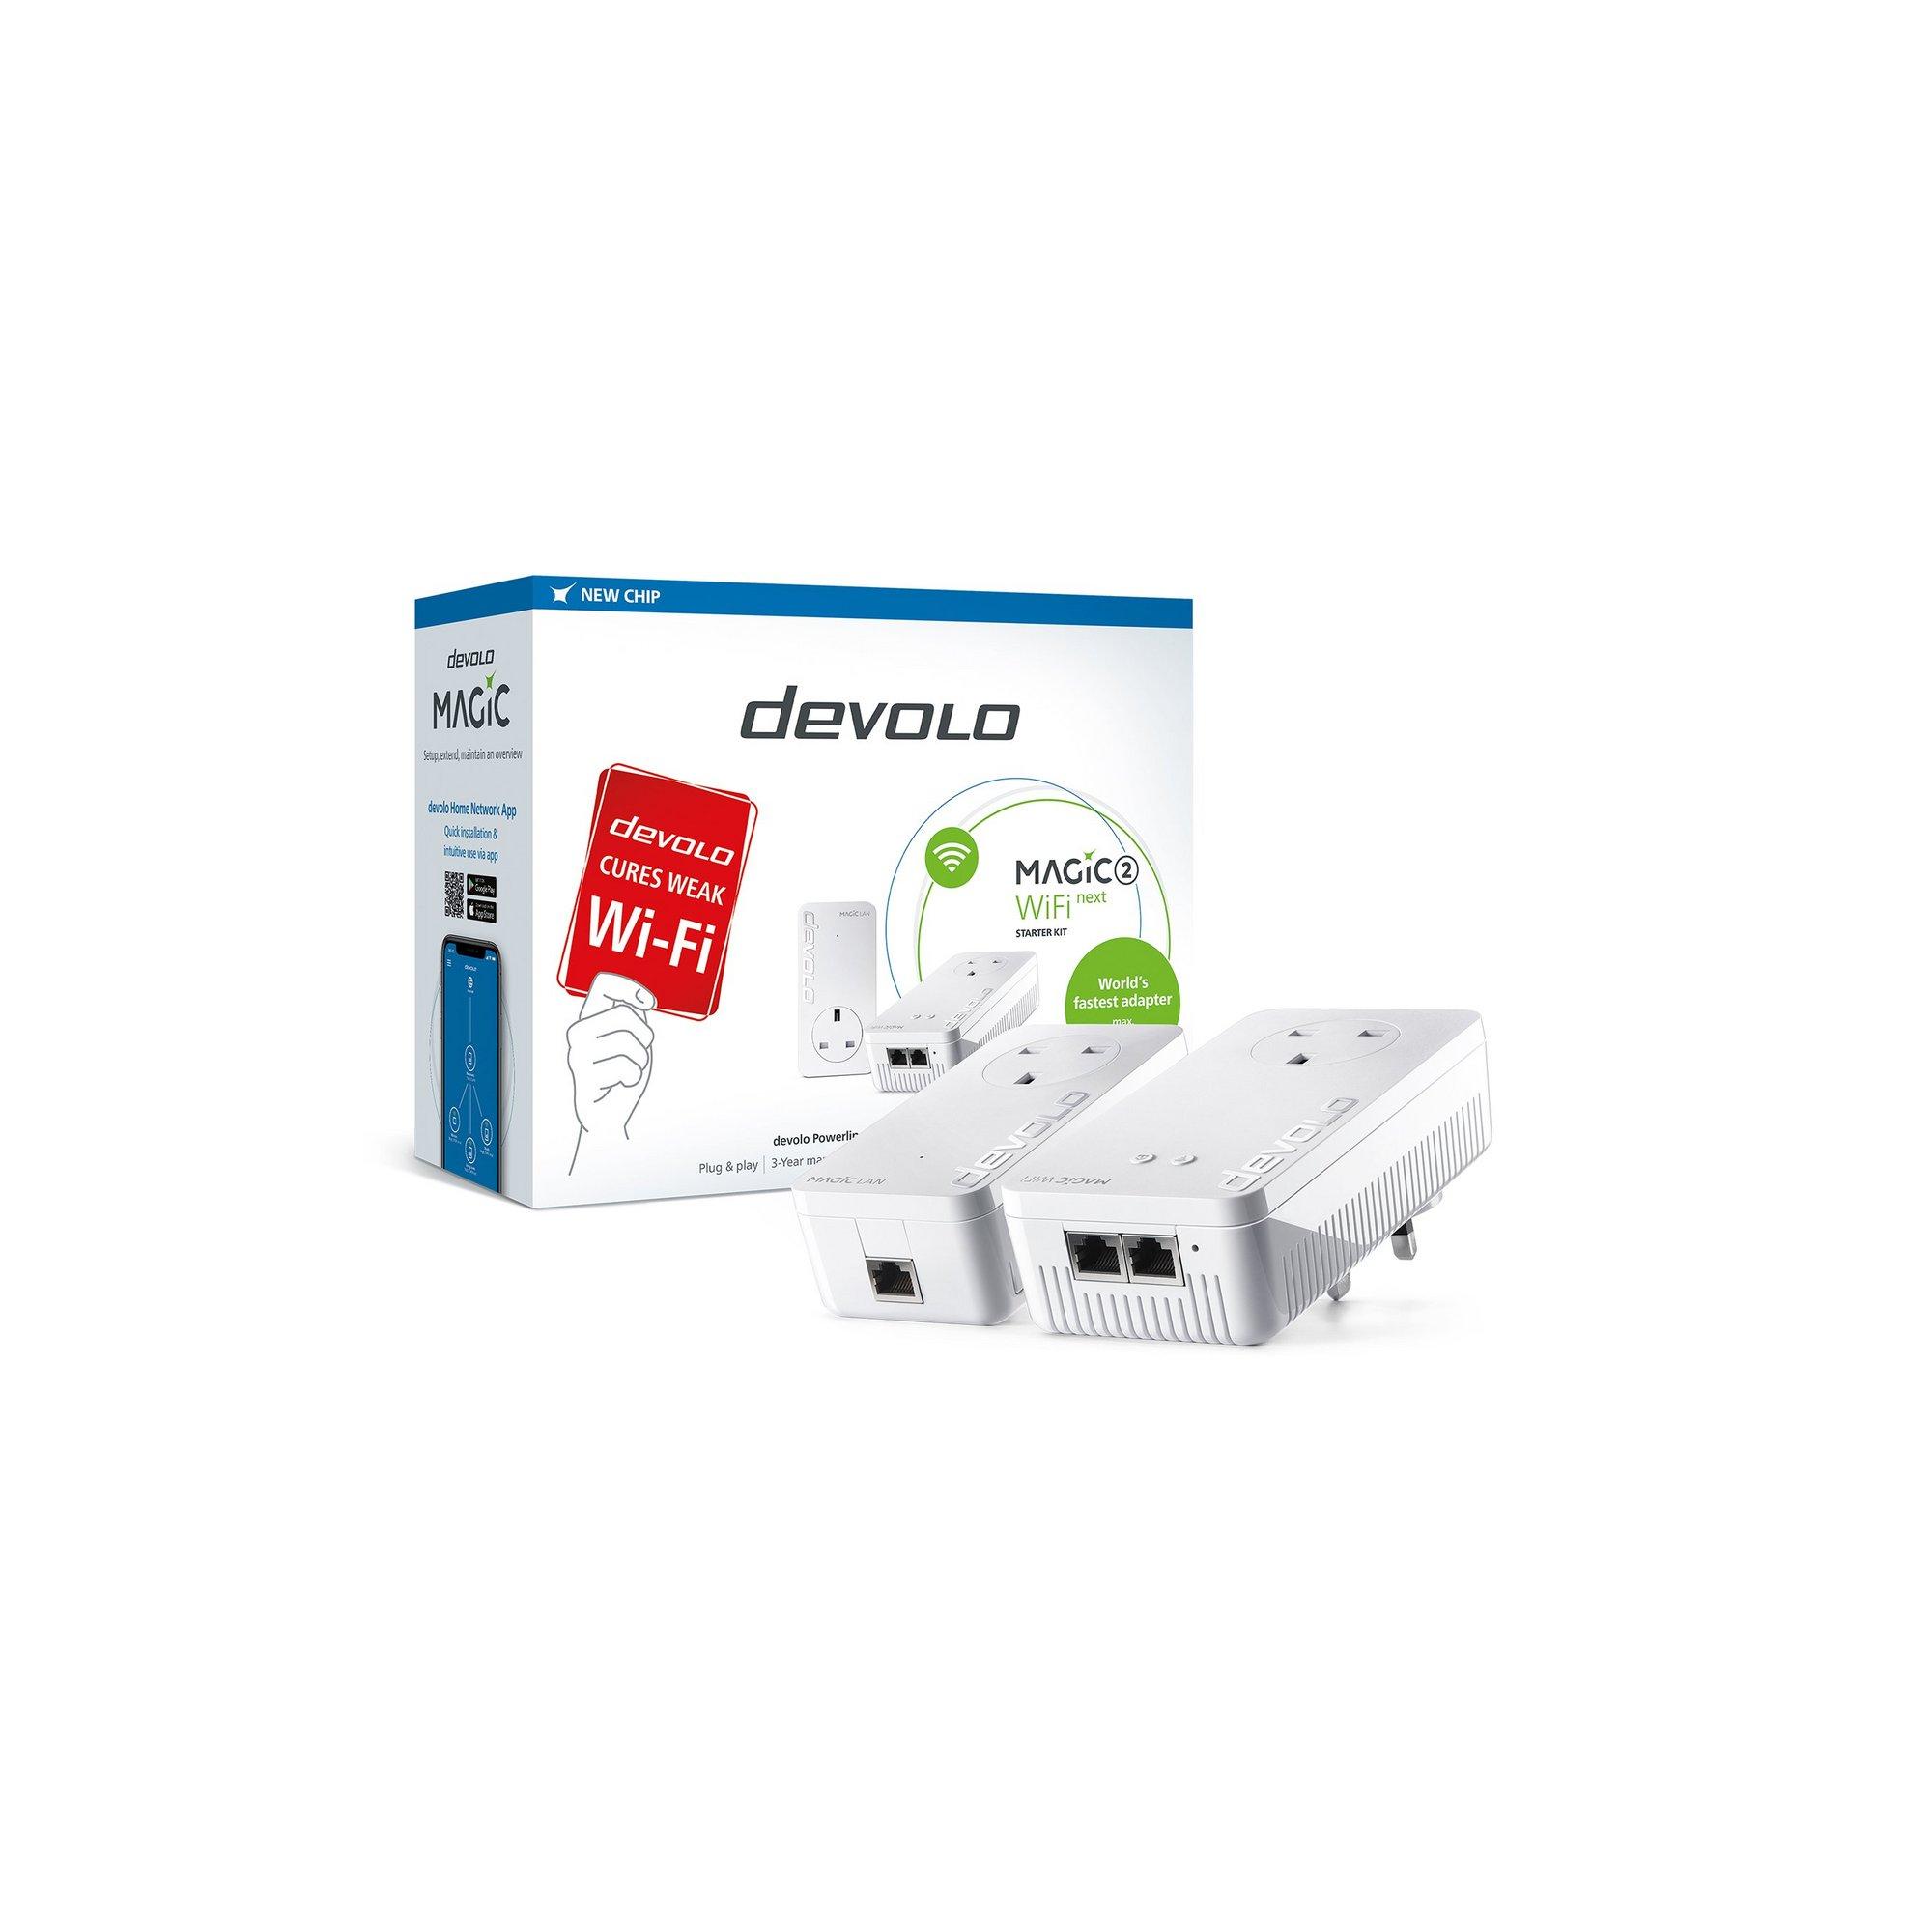 Image of Devolo Magic 2 2400 WiFi NEXT Starter Kit